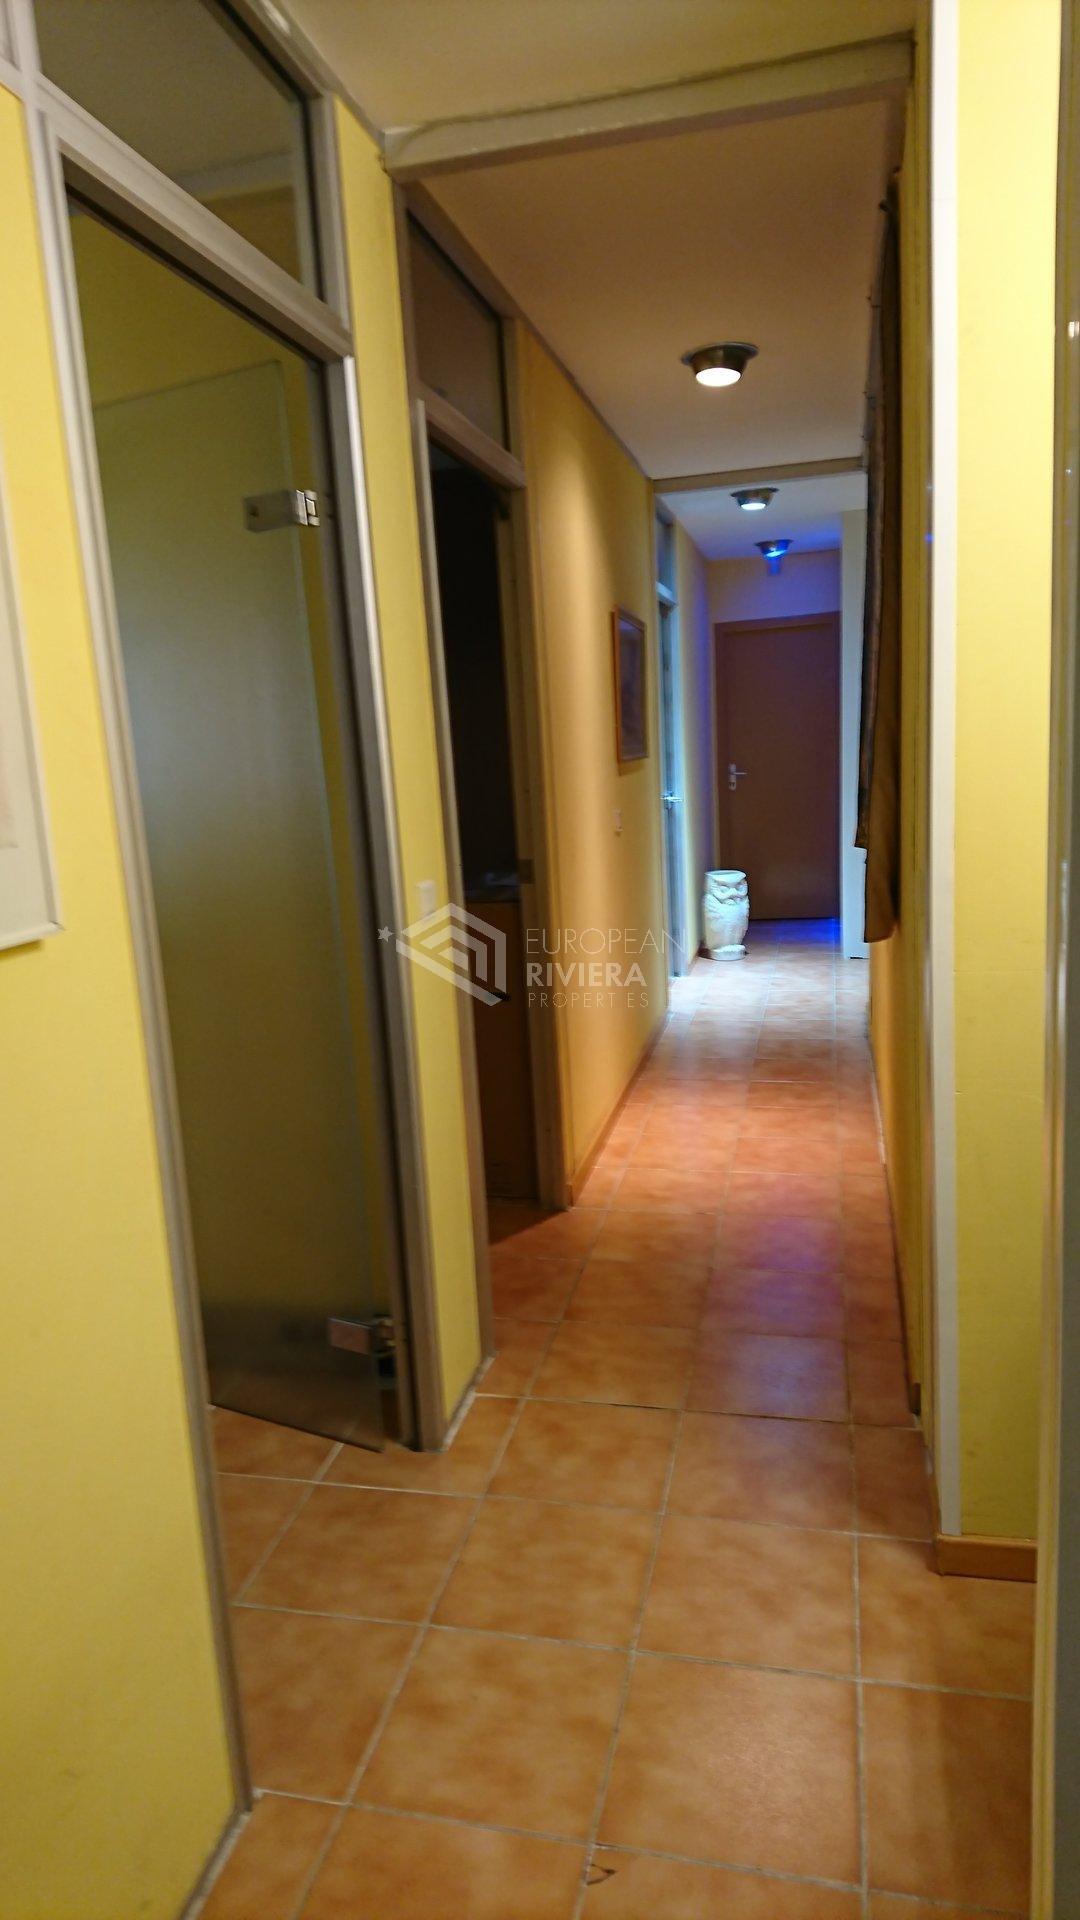 Продажа Квартира - Сен-Лоран-дю-Вар (Saint-Laurent-du-Var) Arnault Tzanck